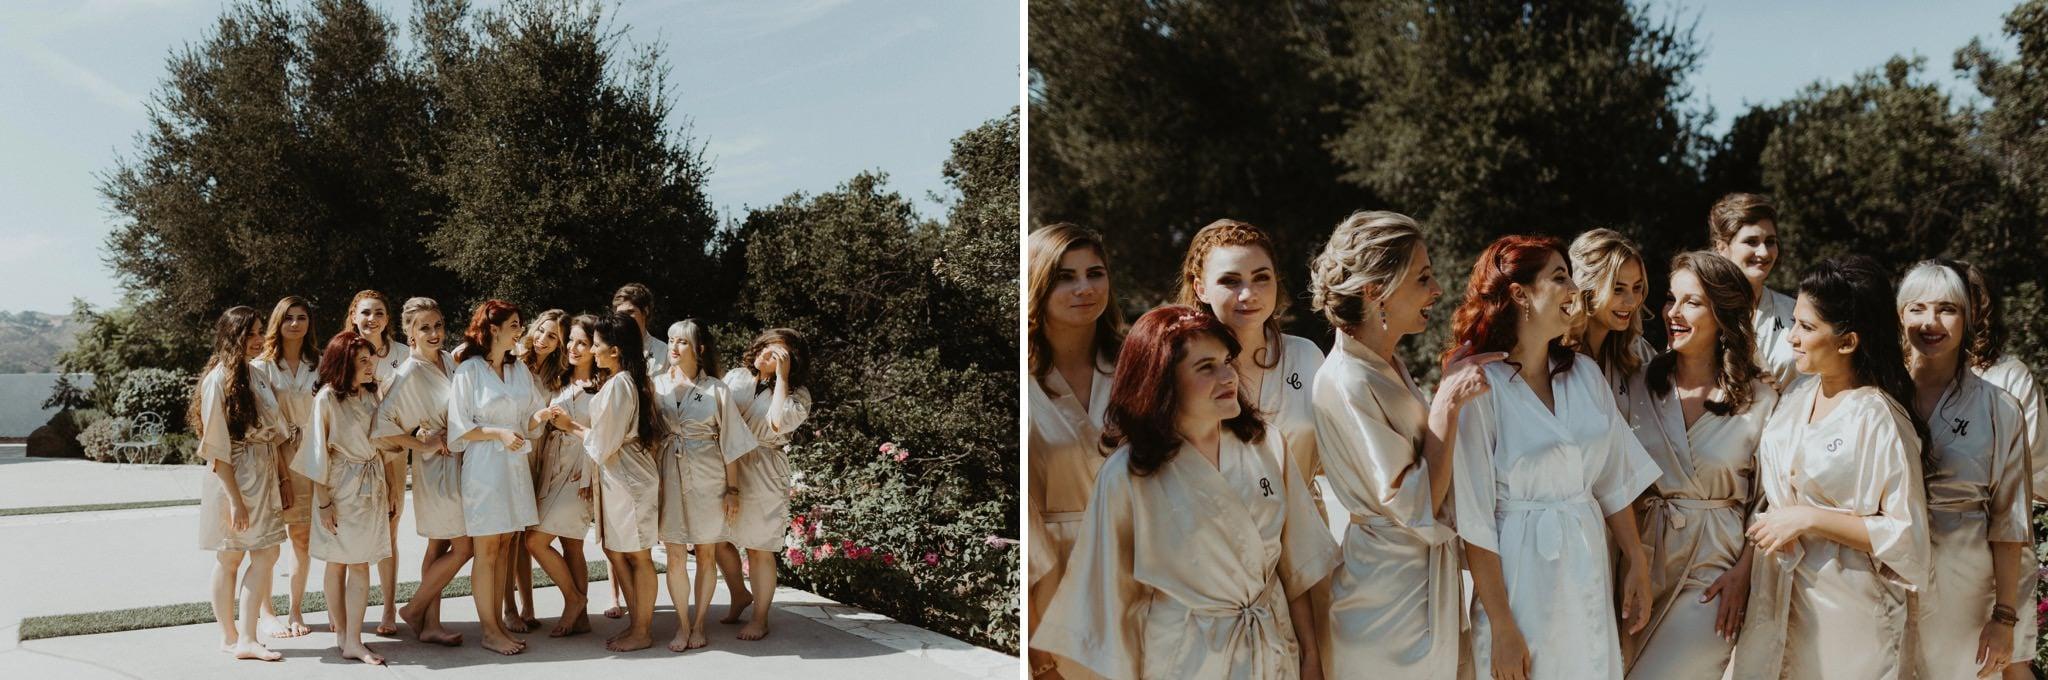 simi valley wedding photography 035